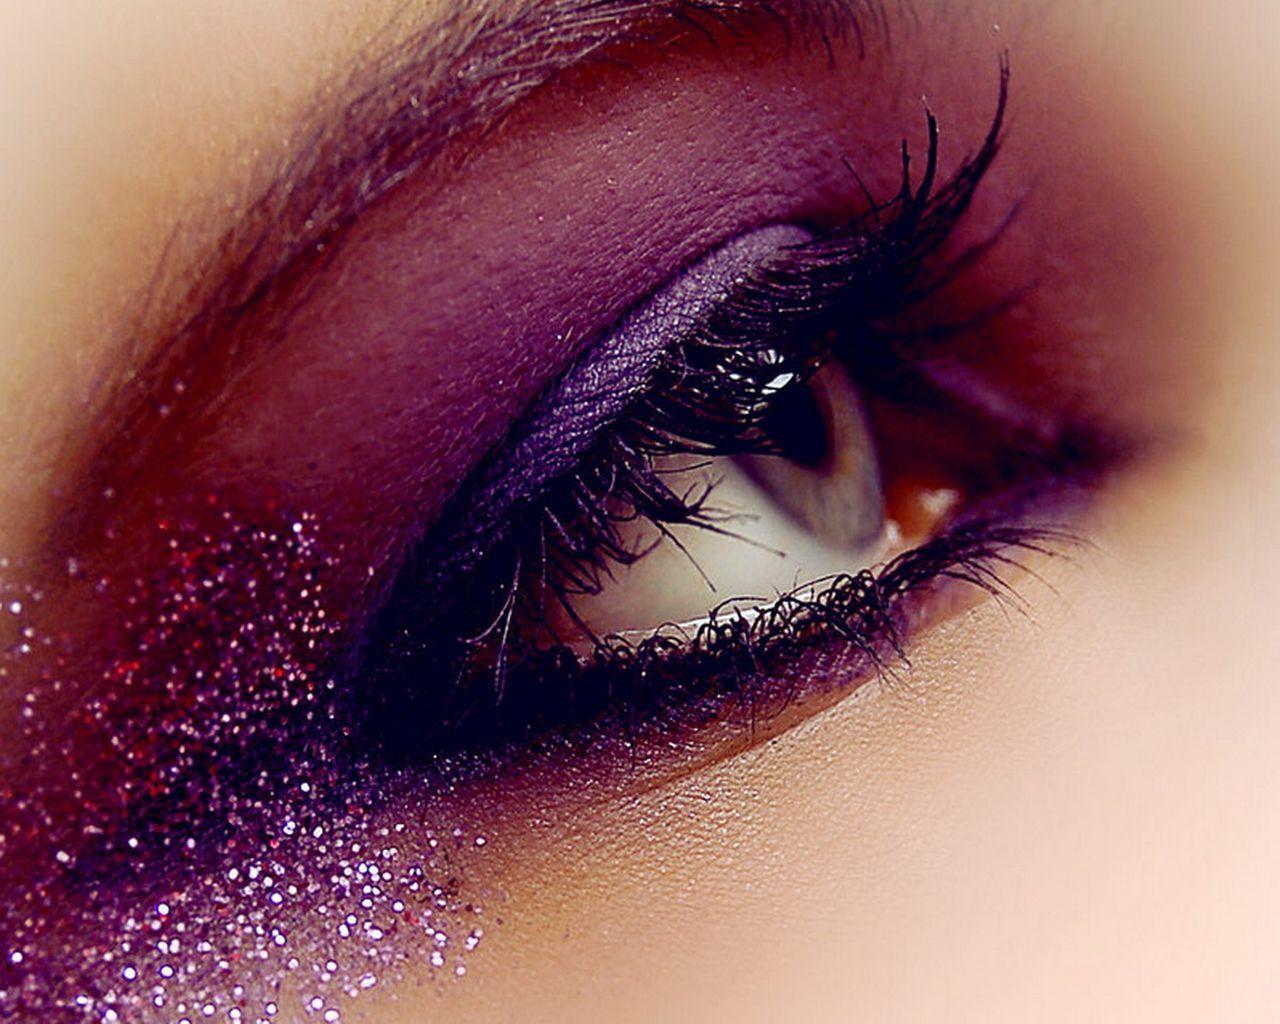 eye makeup wallpaper,eyebrow,eyelash,eye,face,eye shadow